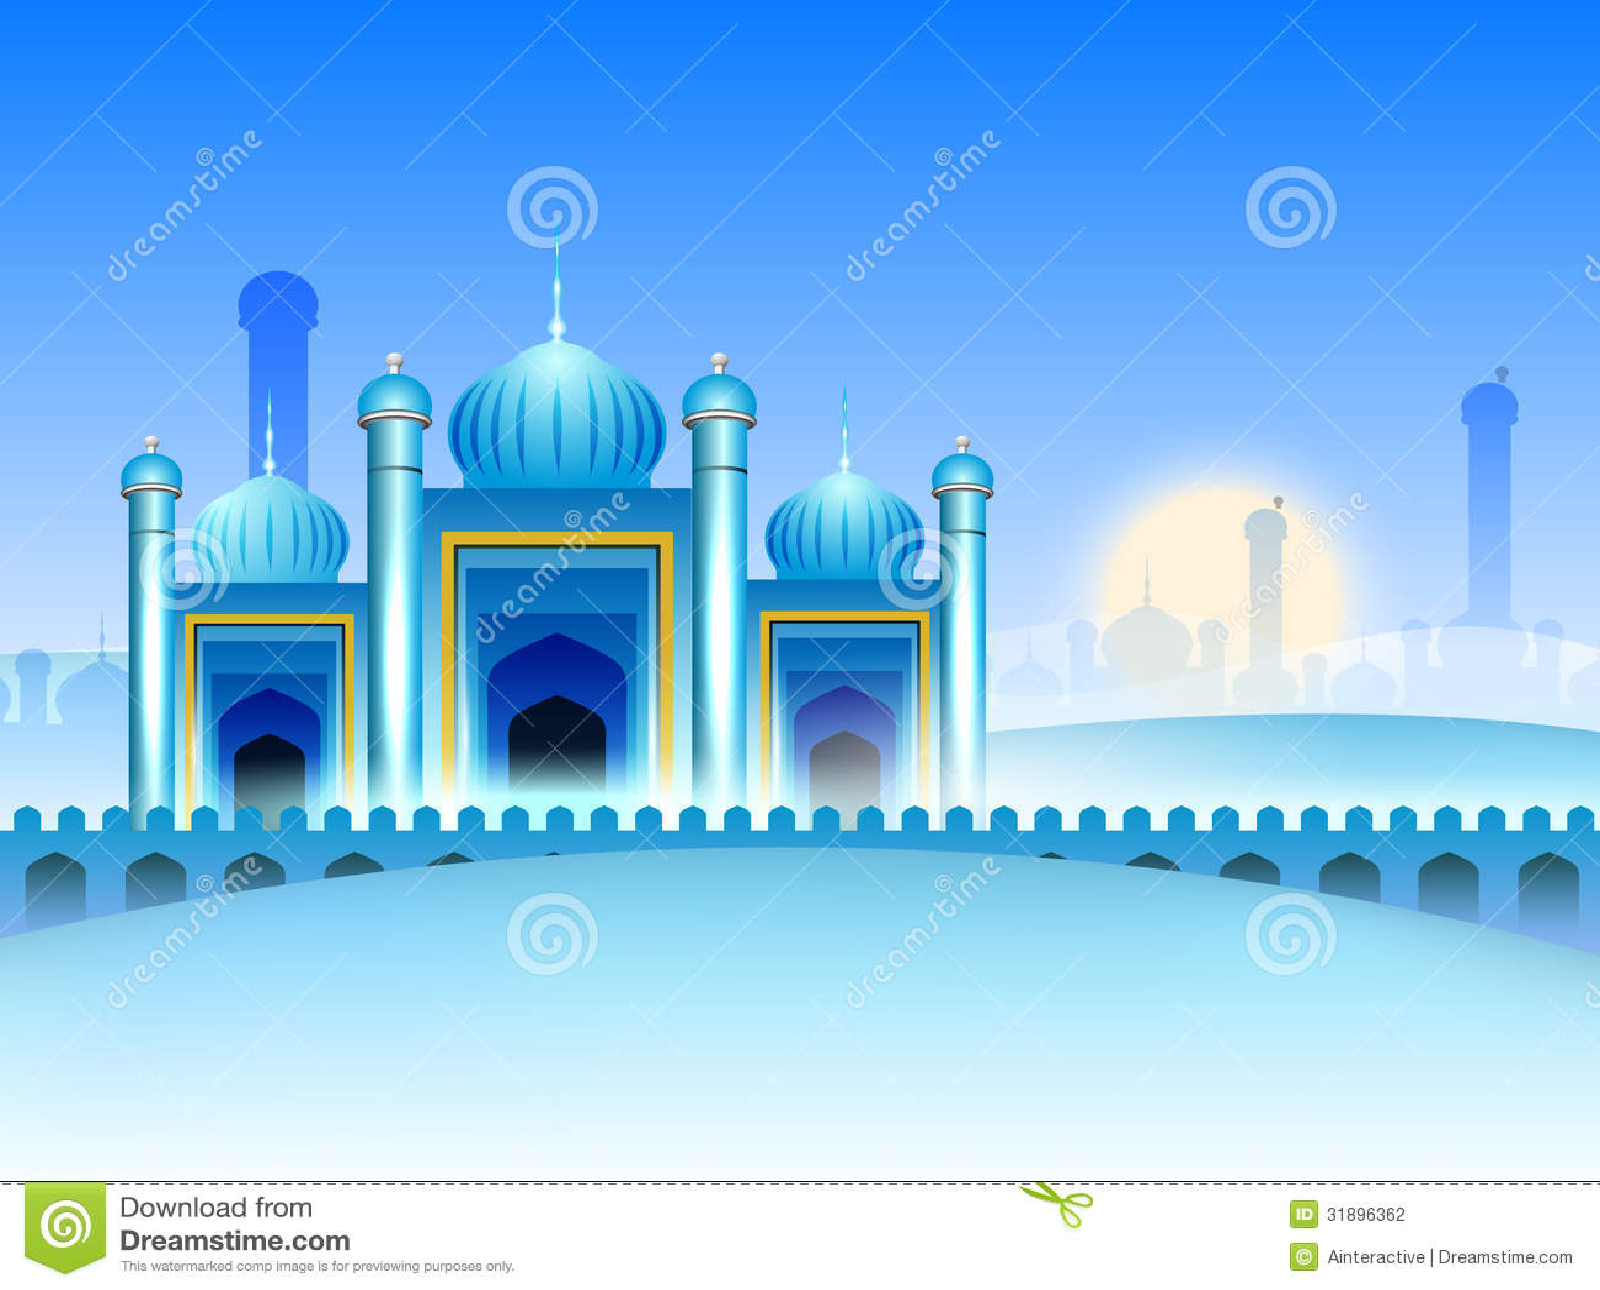 Mosque background for ramadan kareem stock photography image - Royalty Free Stock Photo Background Kareem Mosque Ramadan